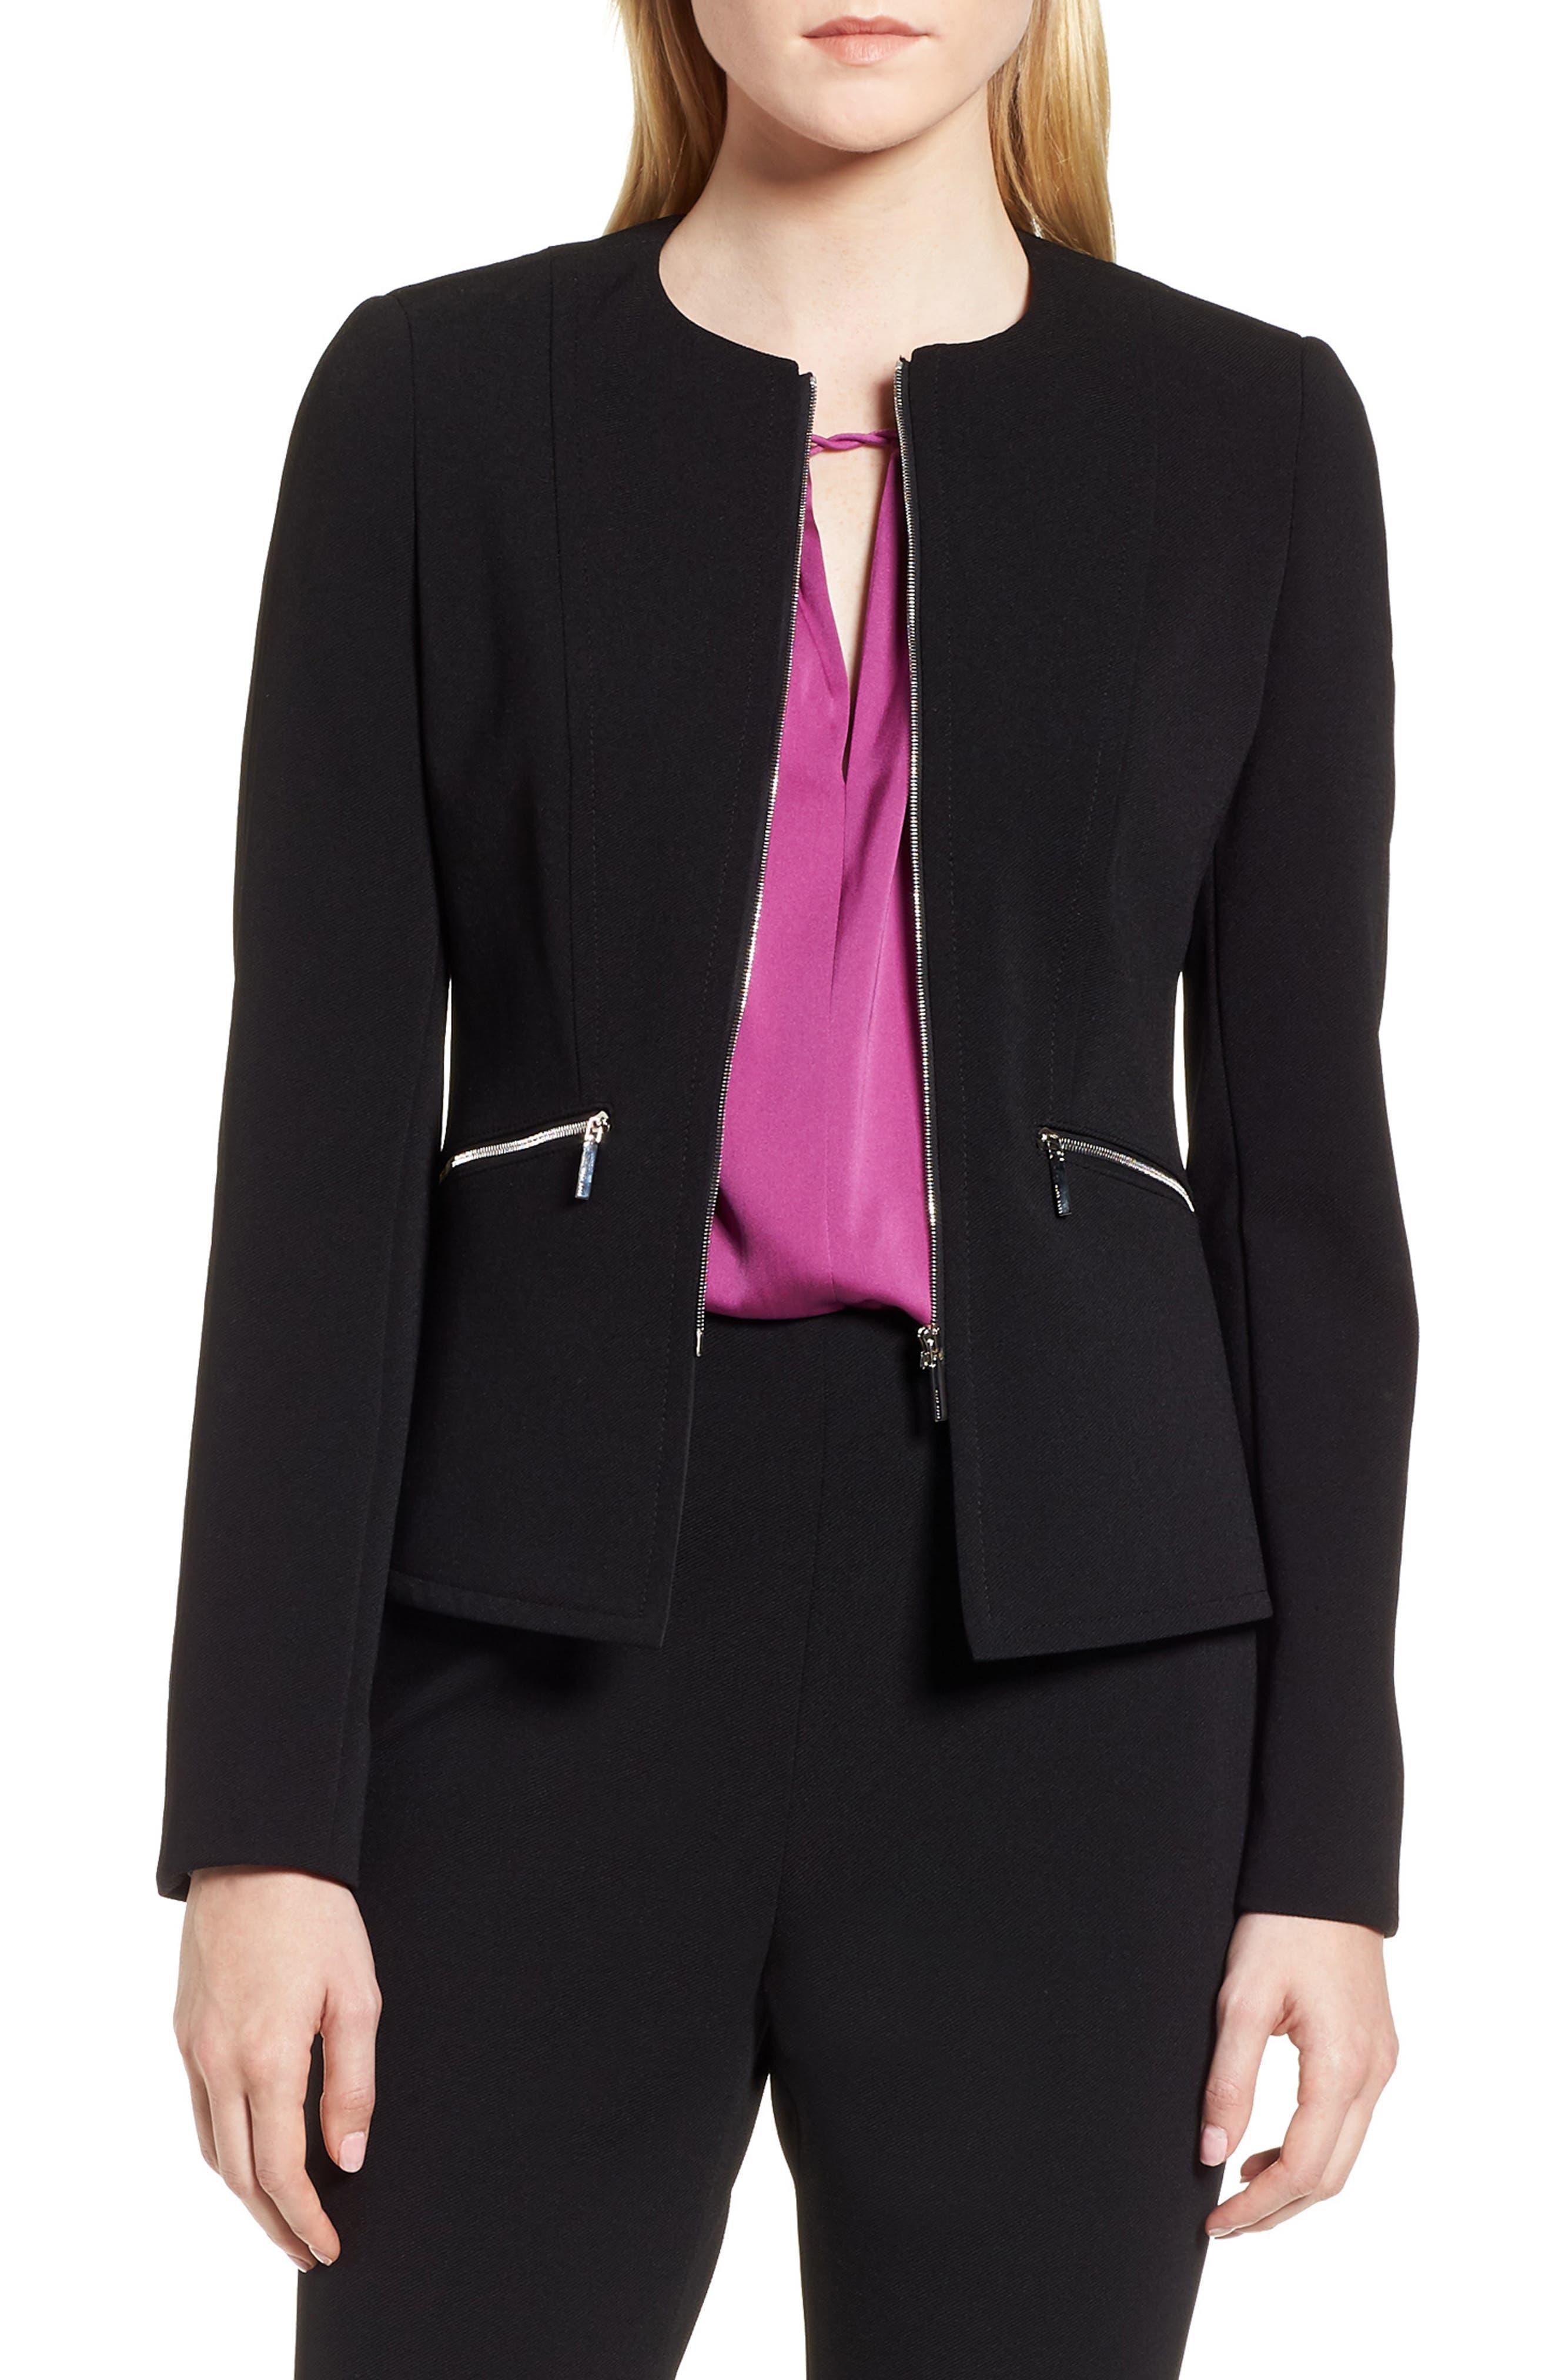 Jazulara Twill Jersey Suit Jacket,                         Main,                         color, Black